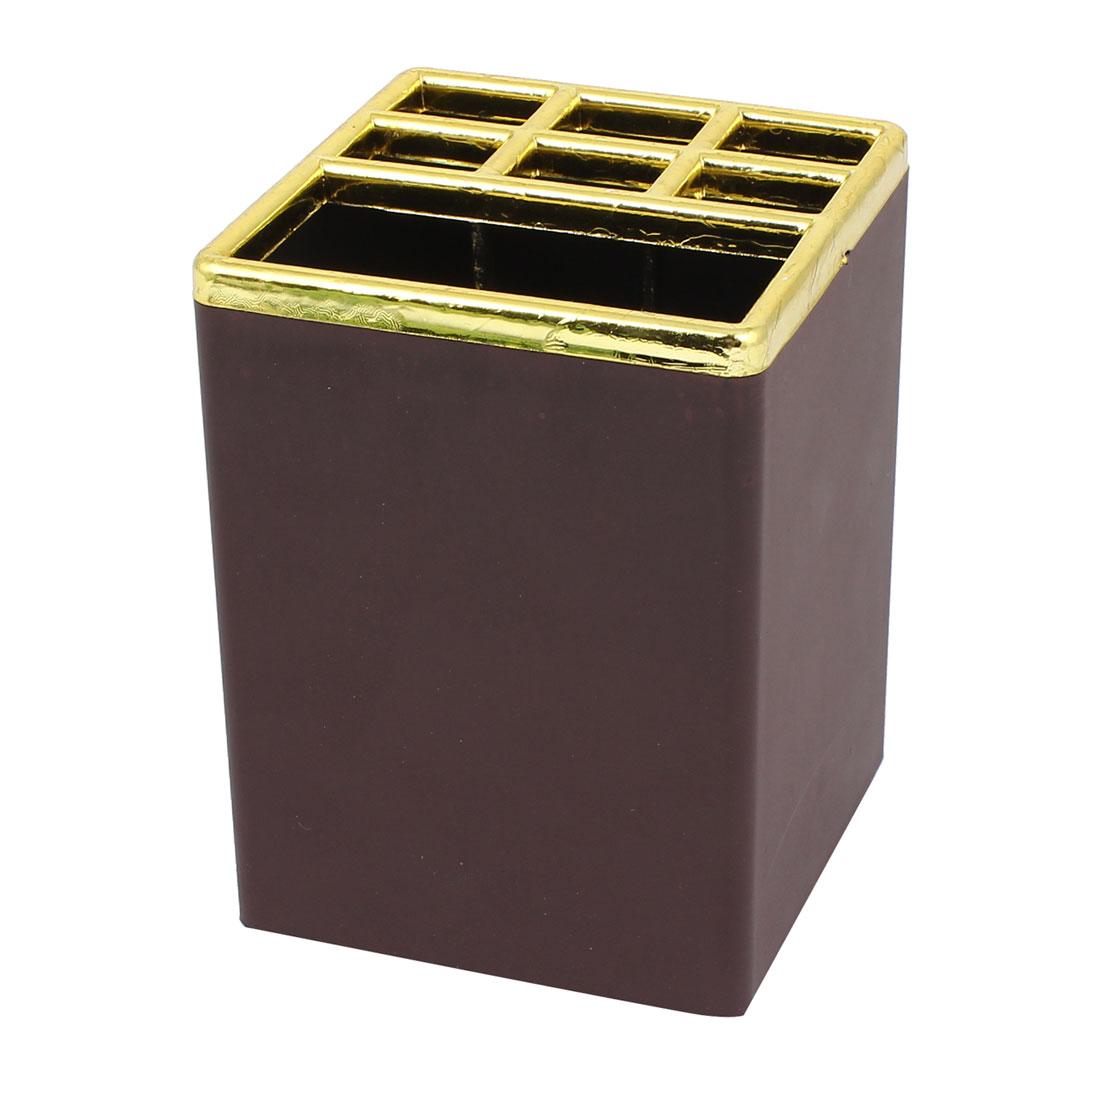 Aluminium Alloy Square Pen Pencil Stationery Stand Holder Organizer Box Dark Brown